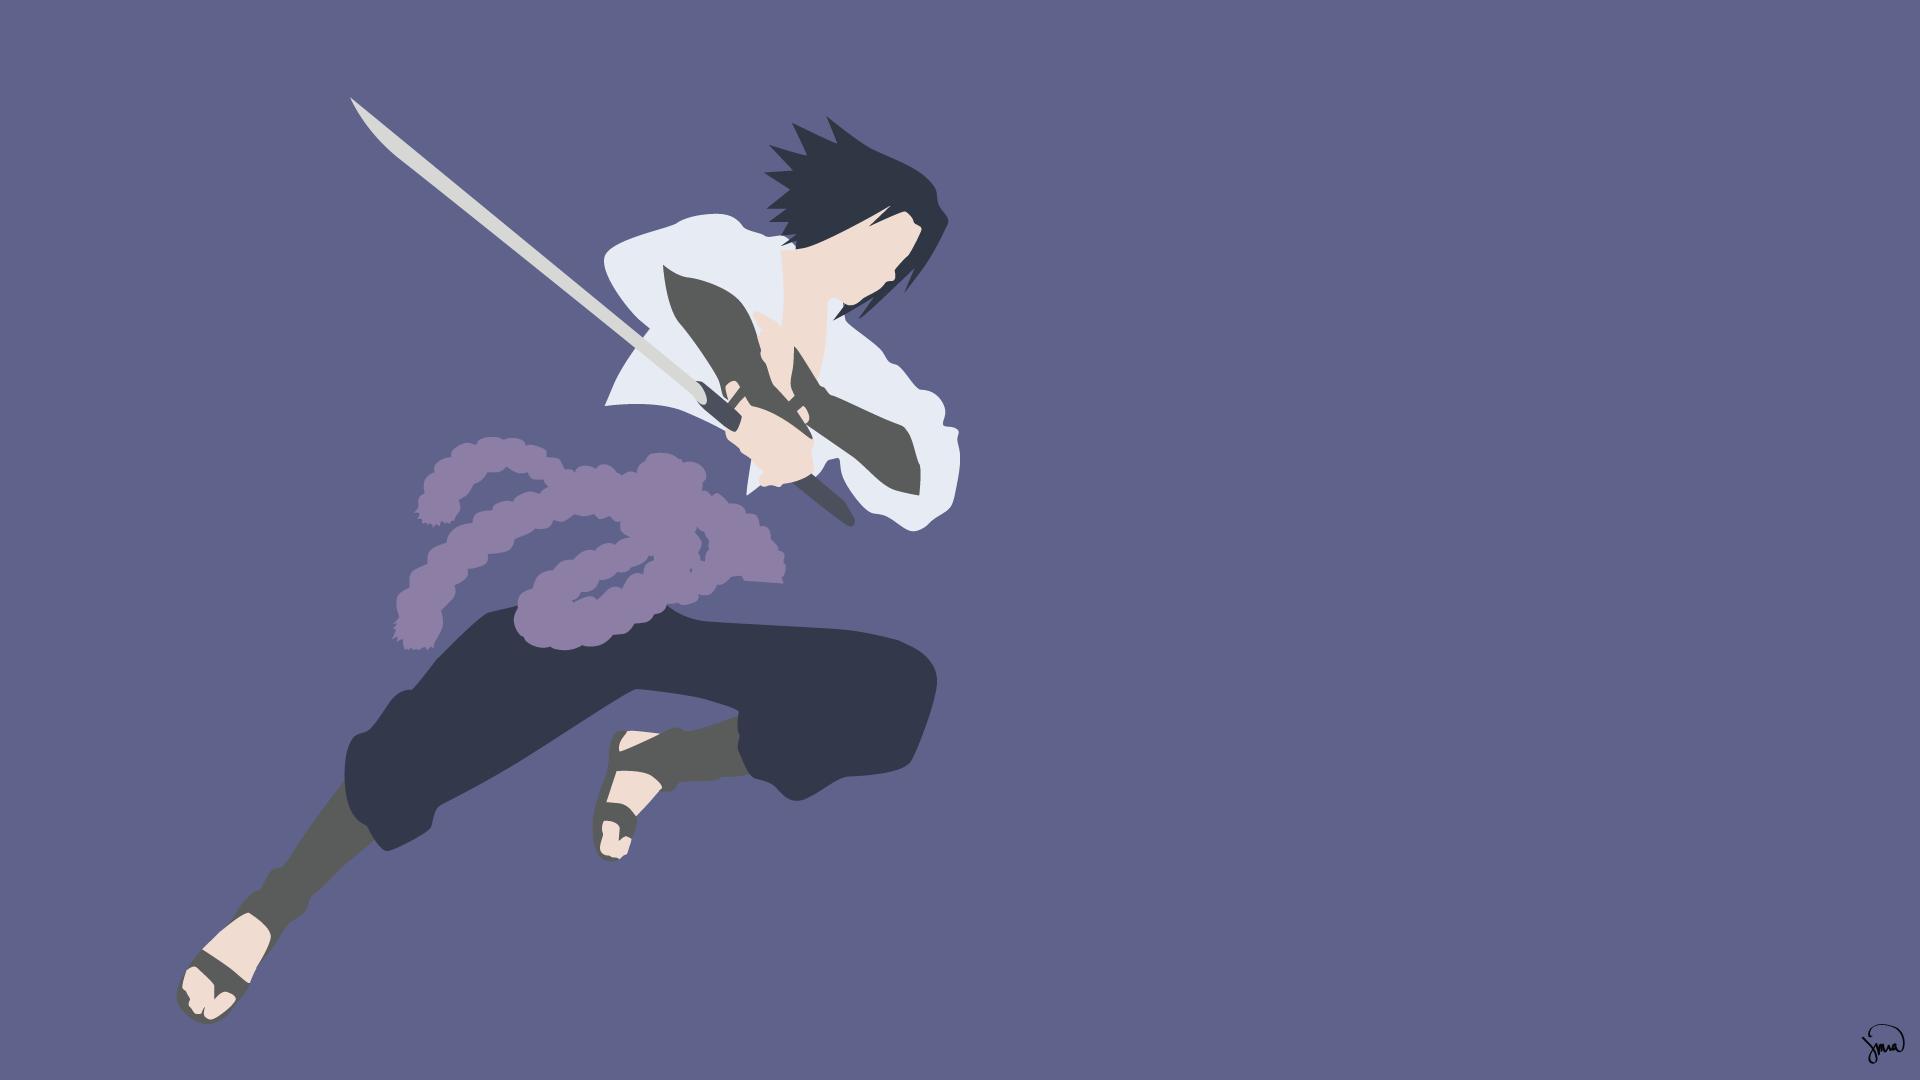 Sasuke Uchiha Fondo De Pantalla Hd Fondo De Escritorio